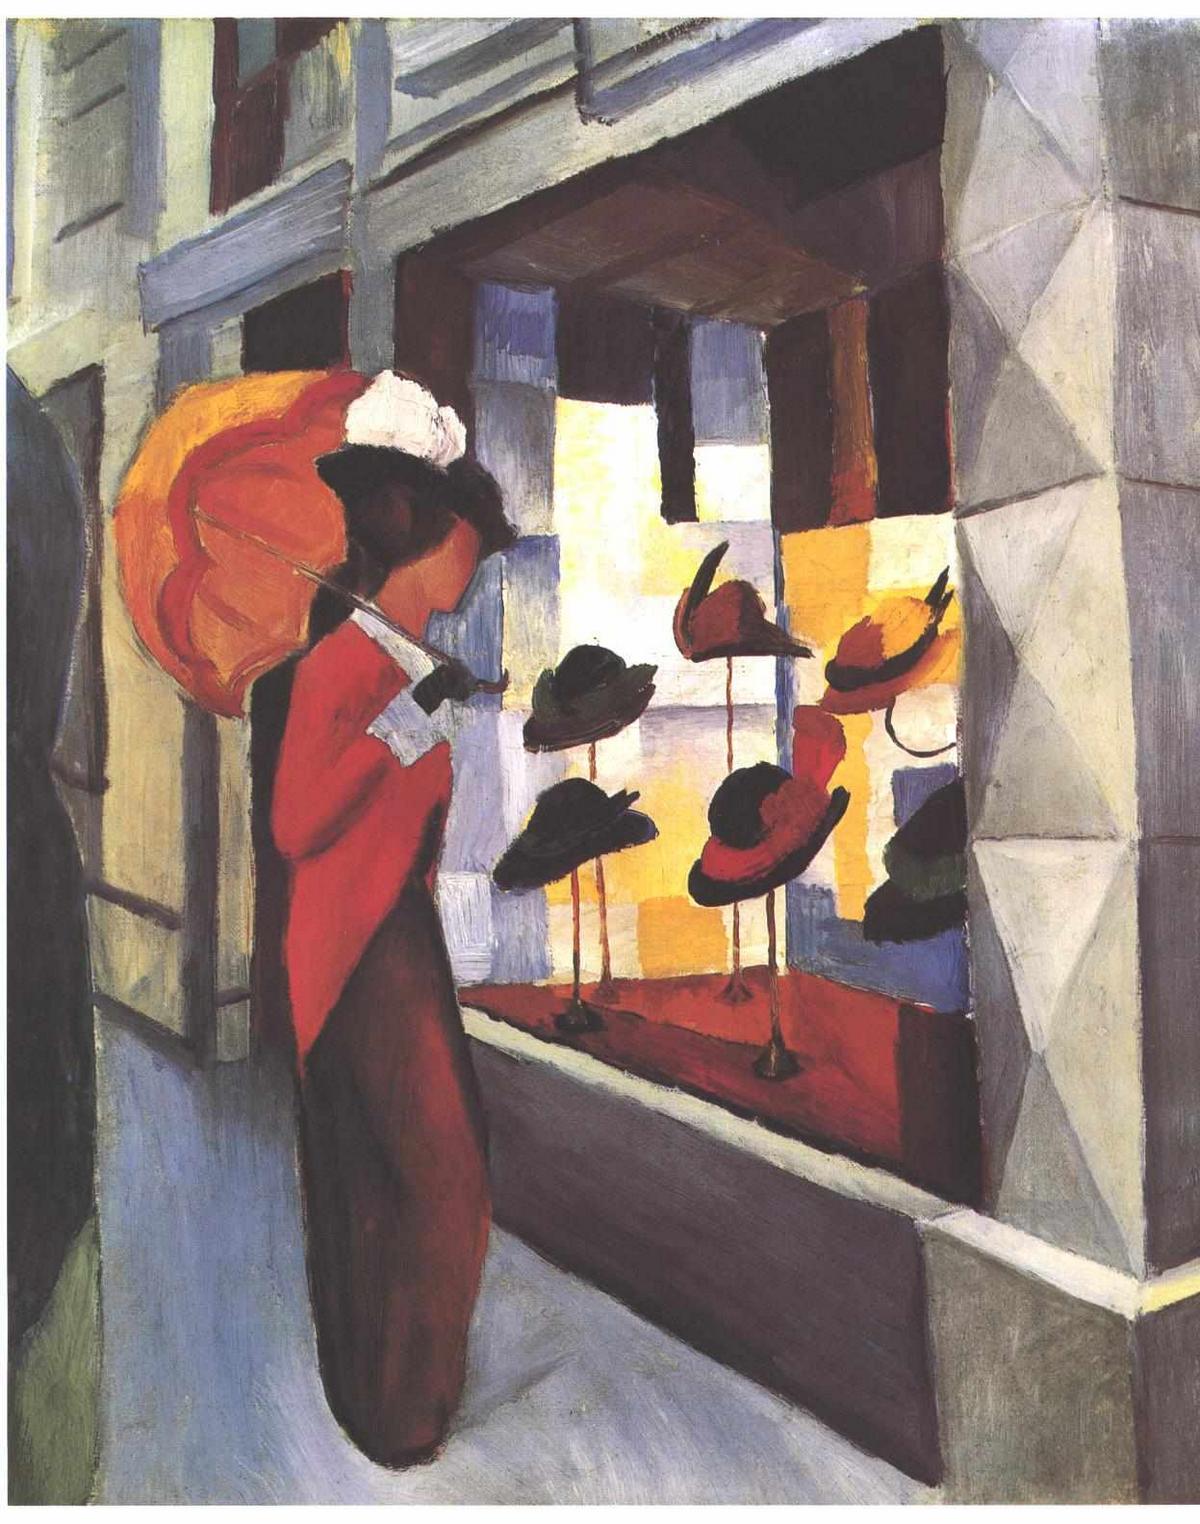 The Hat Shop - August Macke